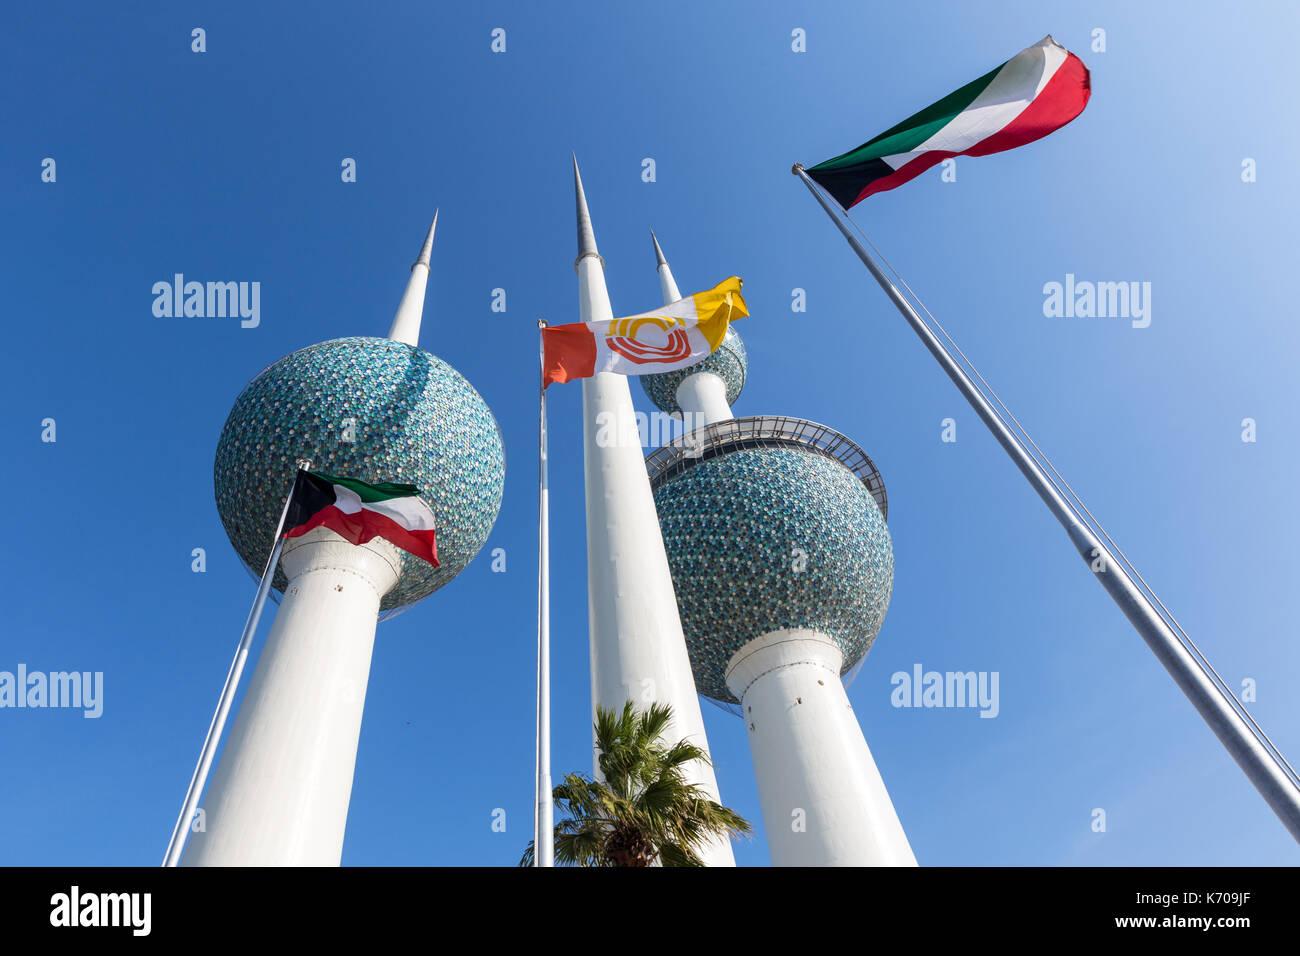 Kuwait Towers - Stock Image